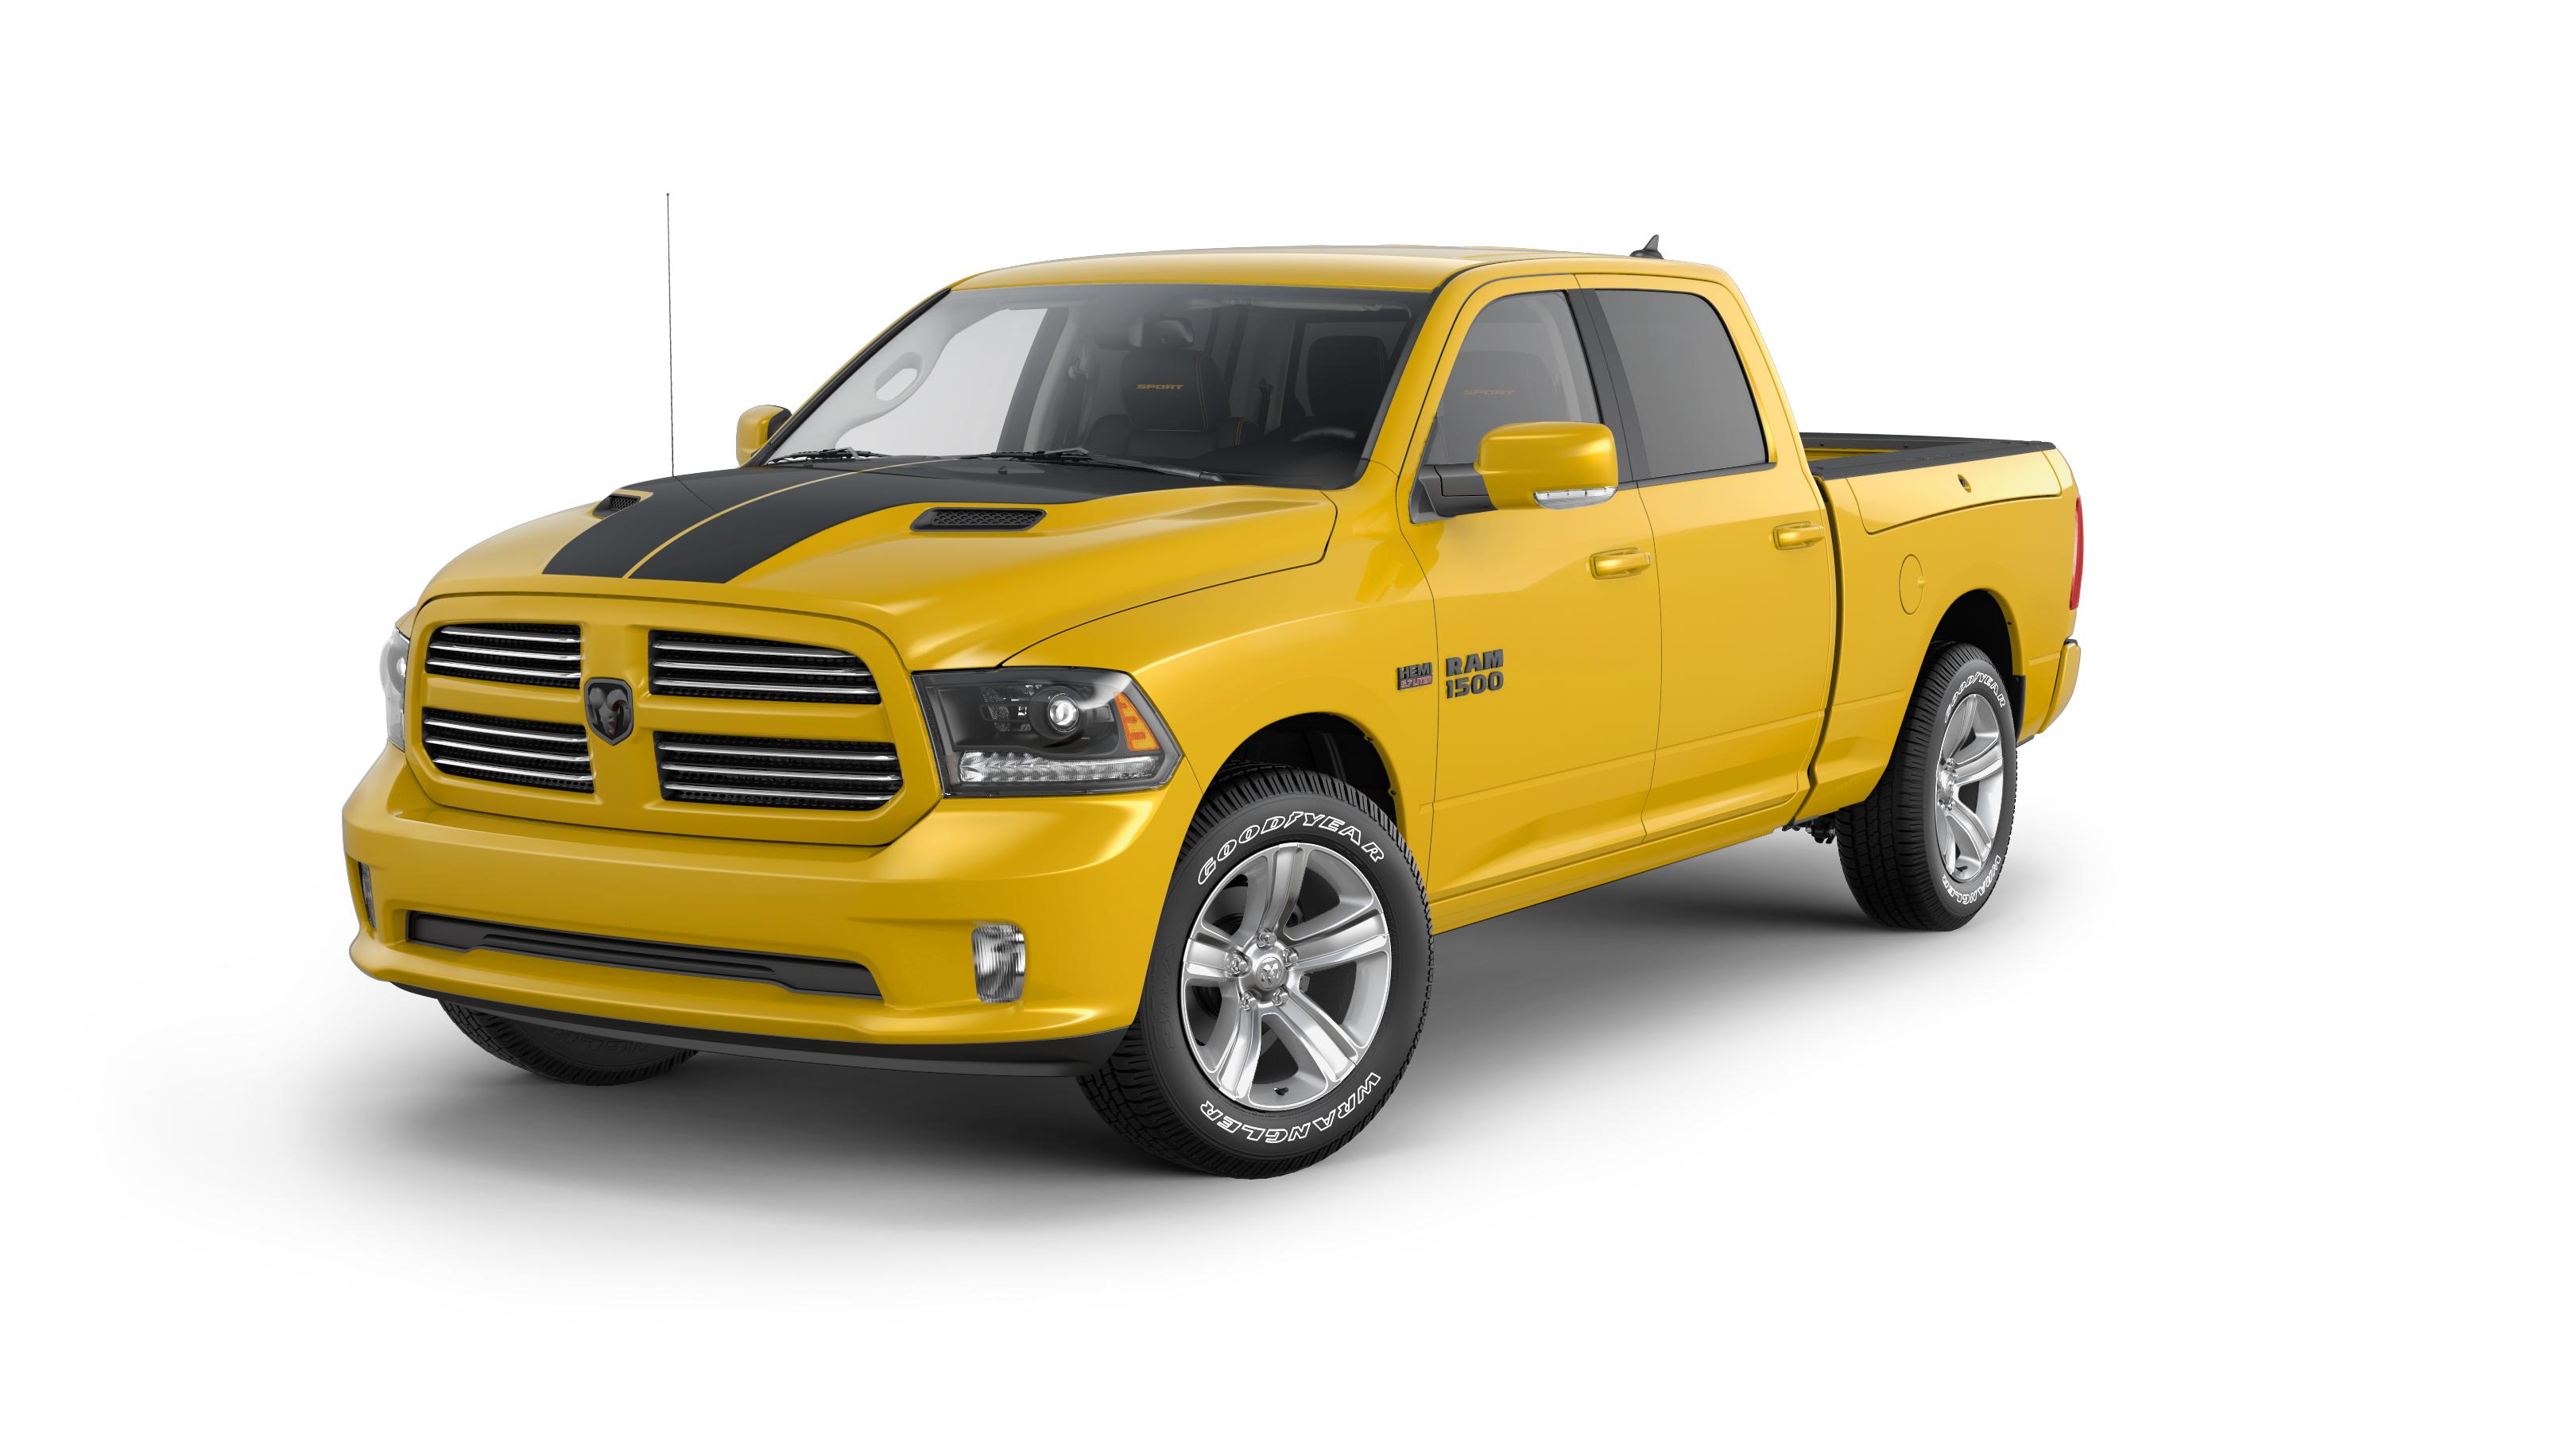 Ram Stinger Yellow 1500 Sport